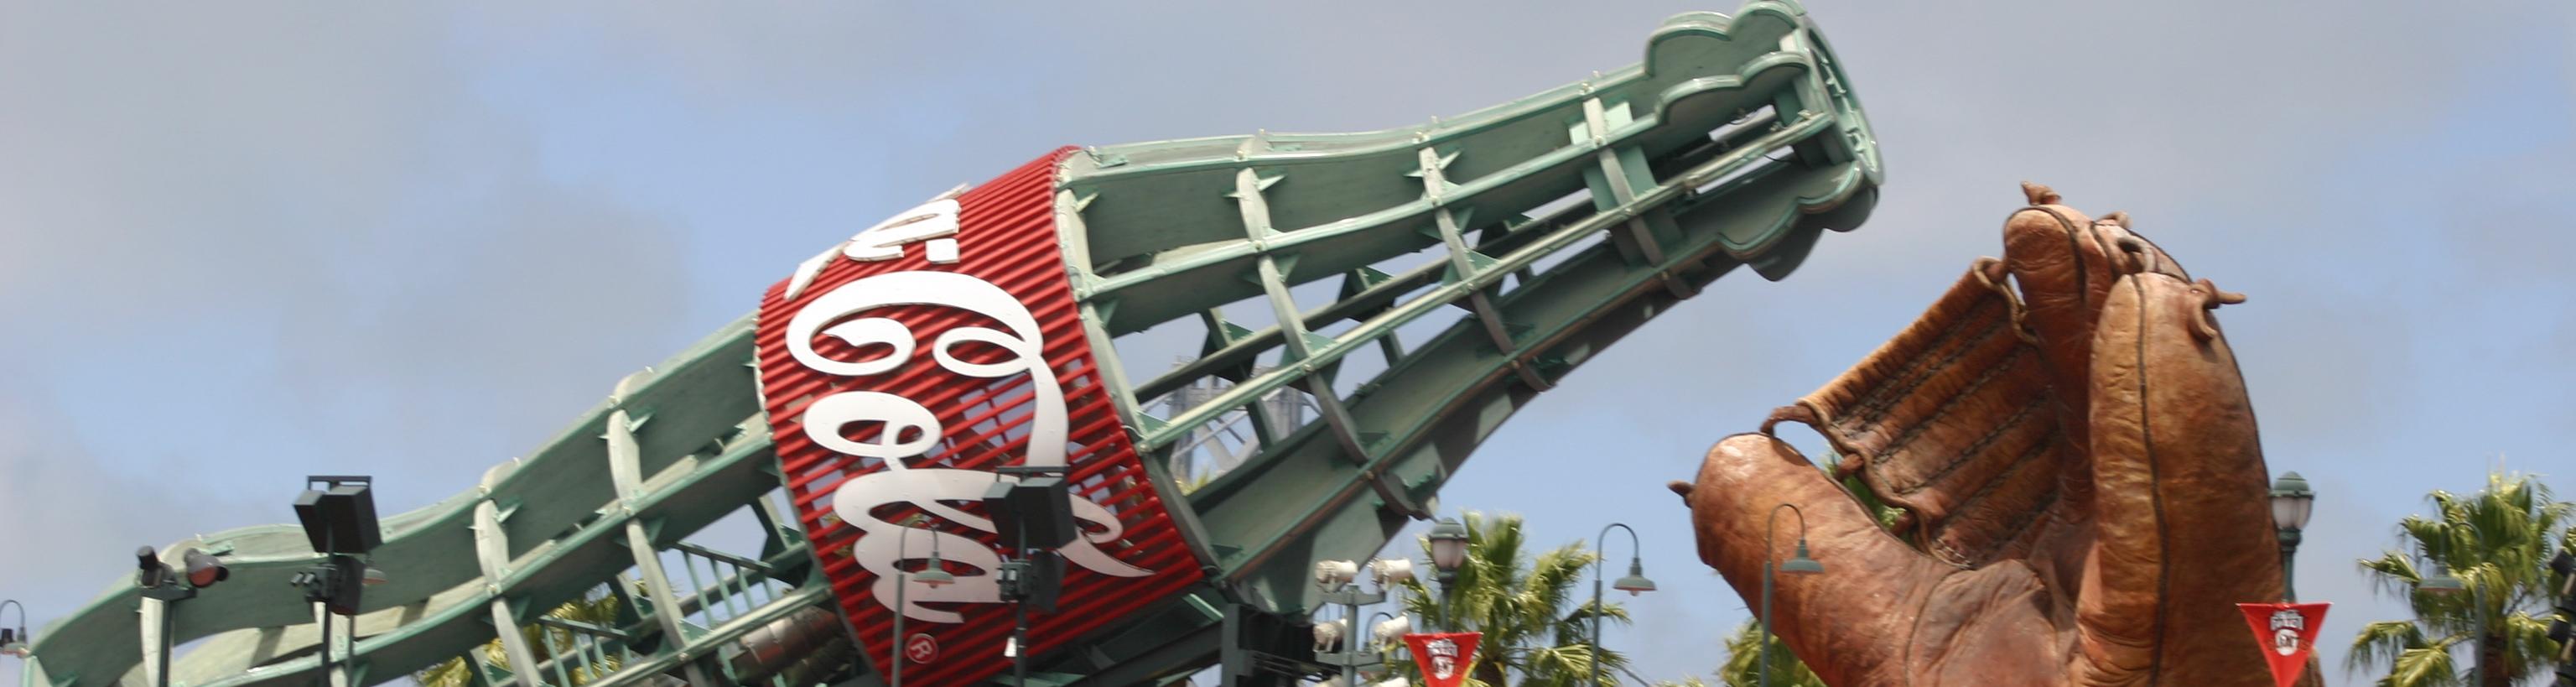 AT&T Park,San Francisco Tours,West Coast Baseball Tour,Baseball Road Trip